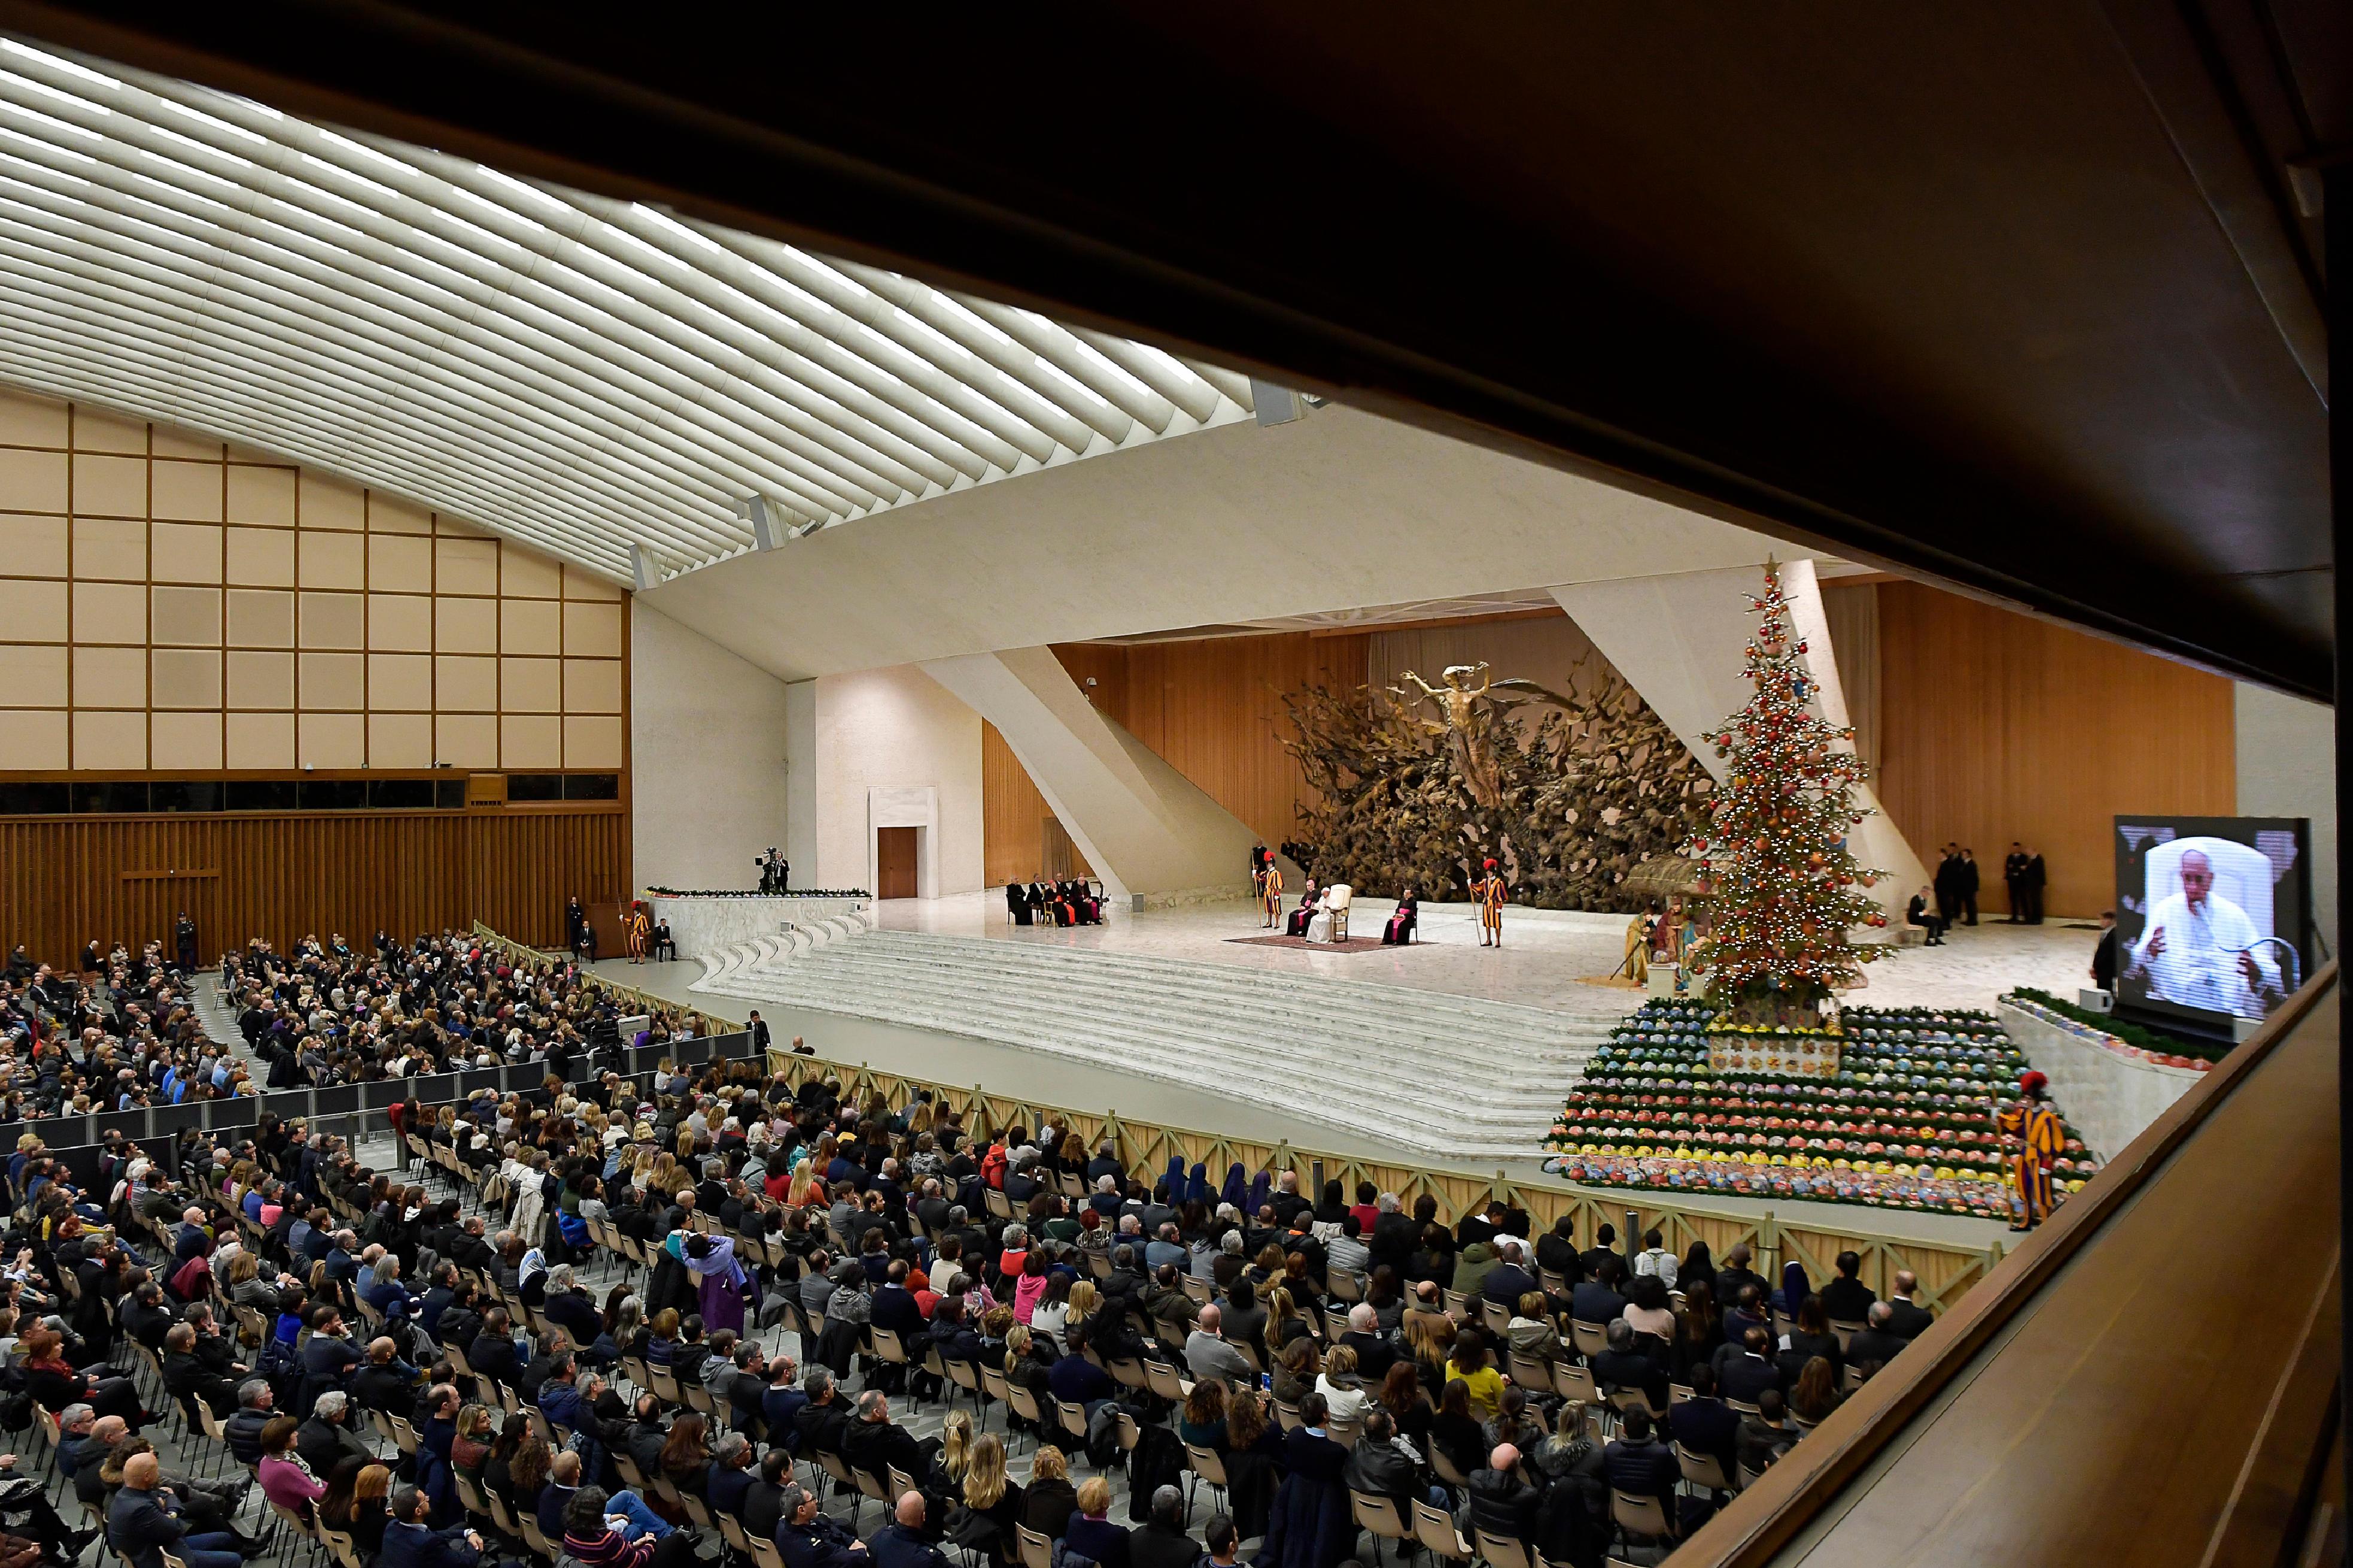 Voeux de Noël aux employés du Vatican © Vatican Media